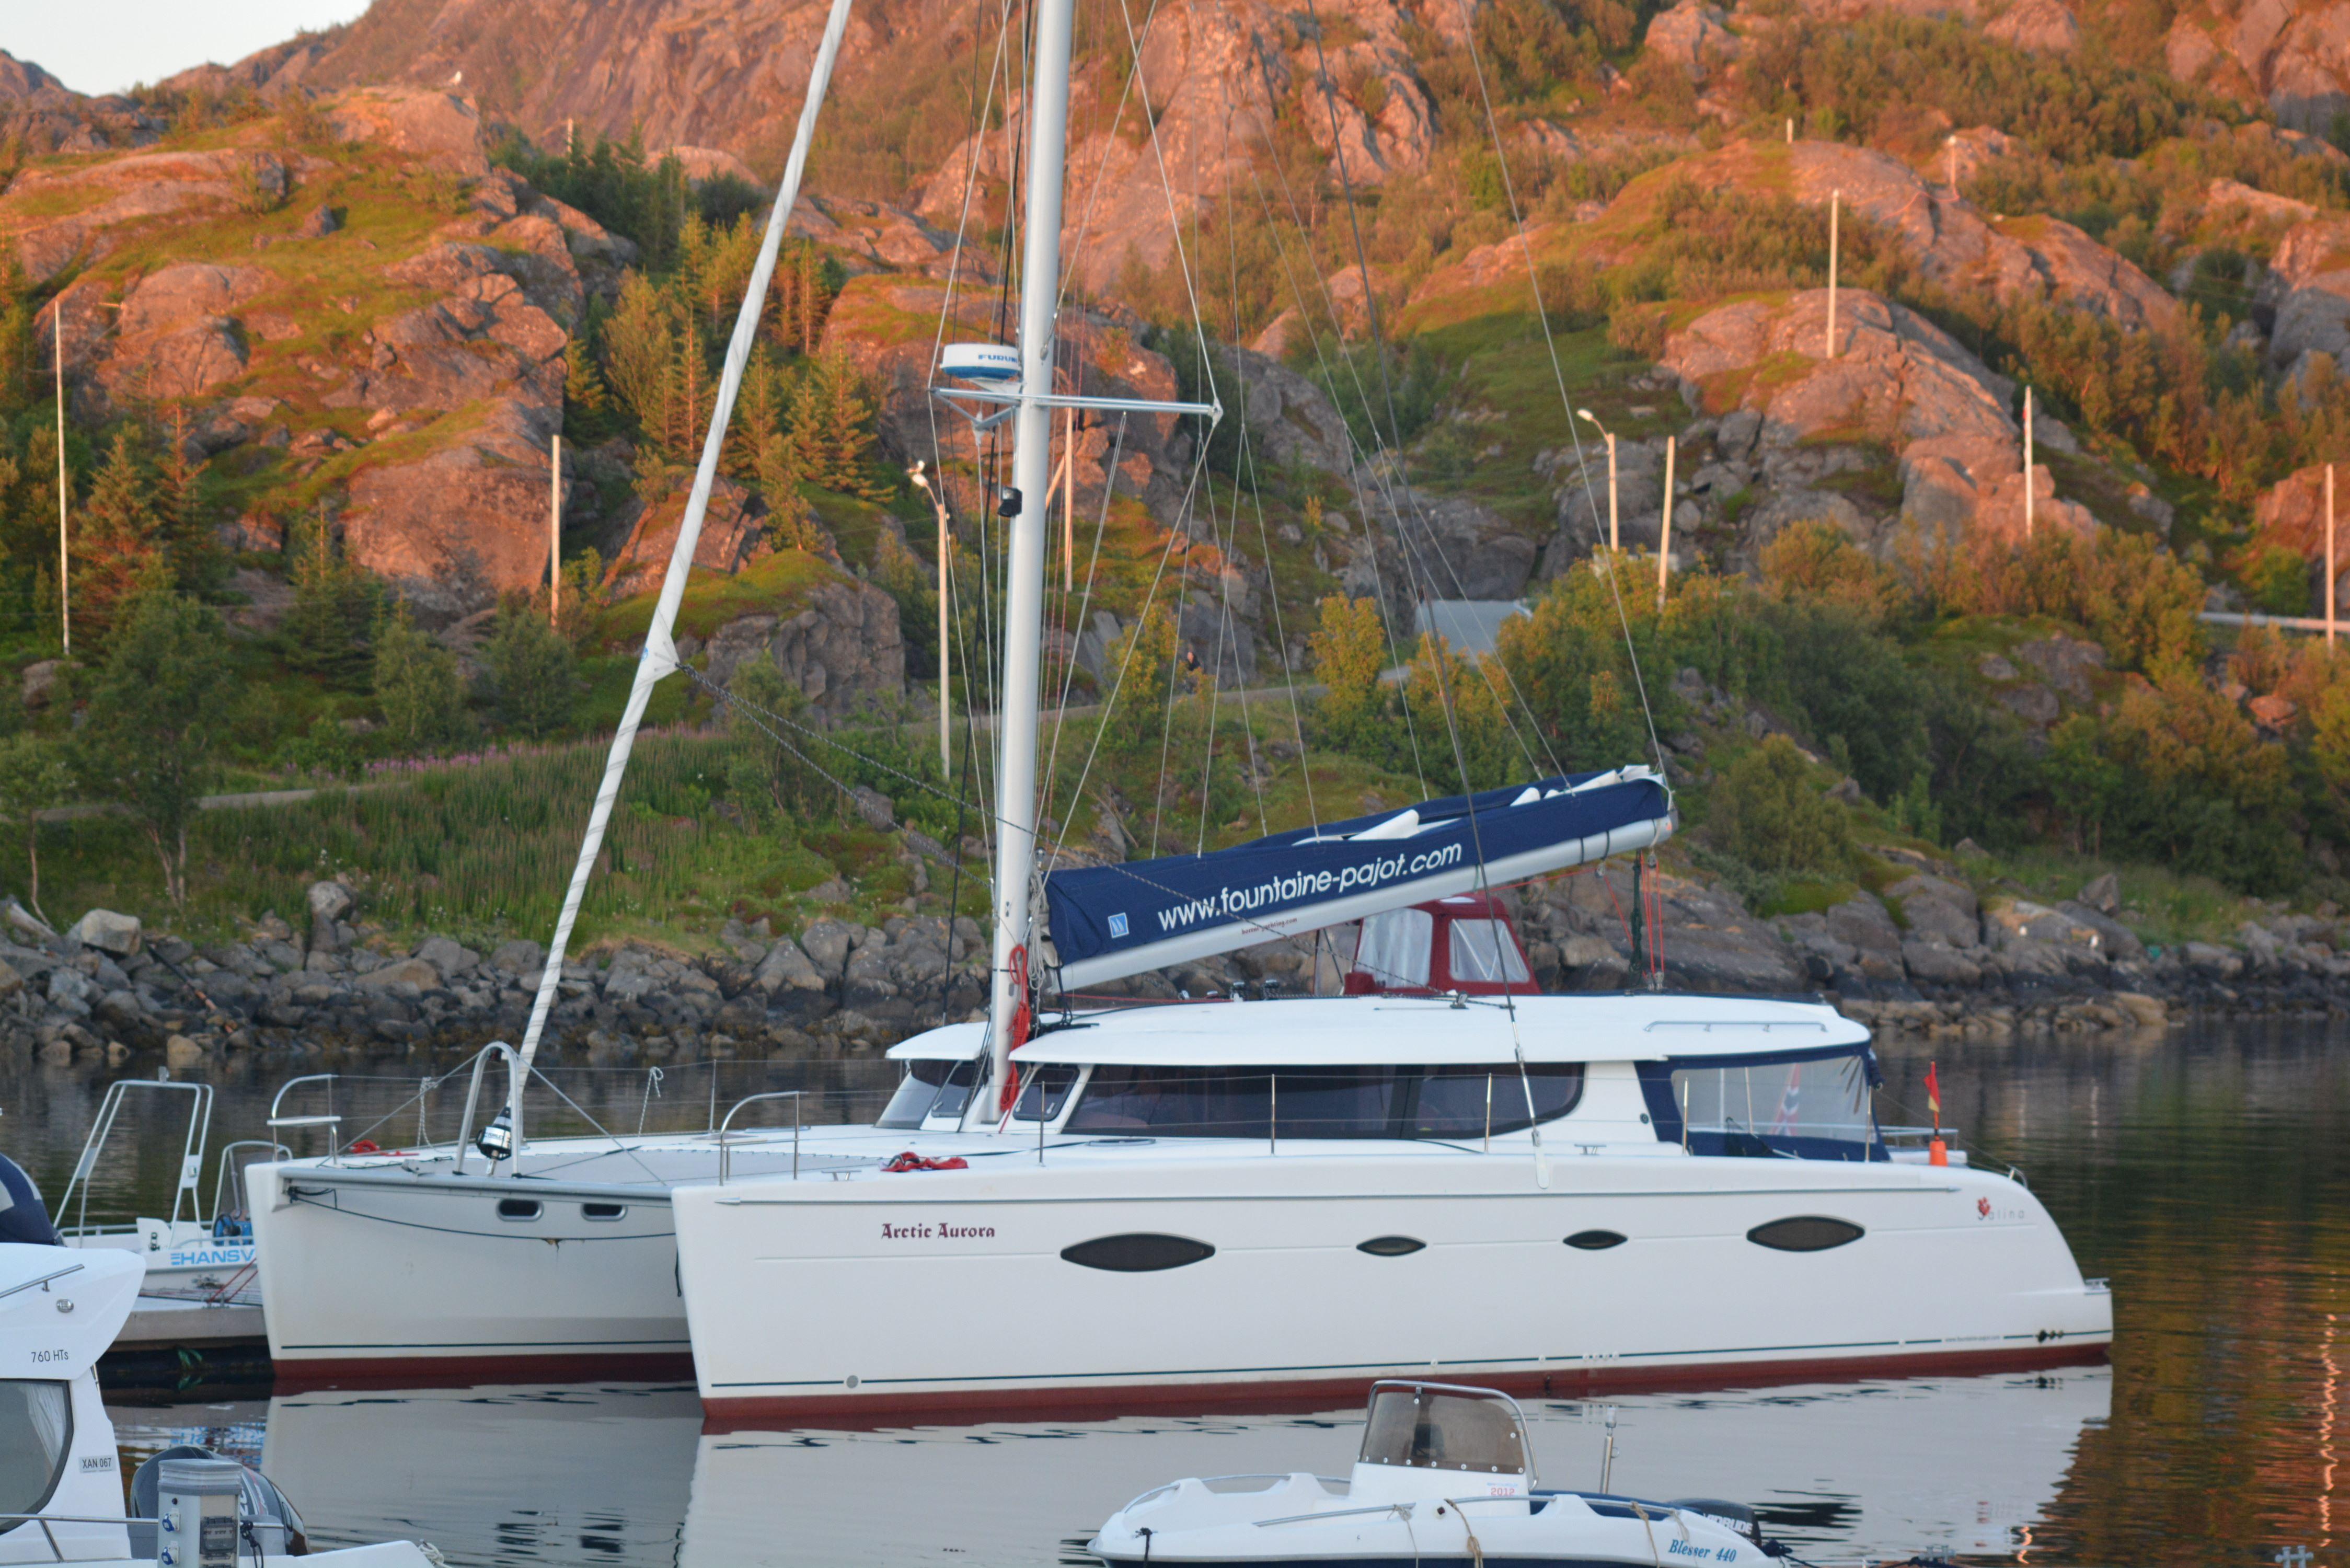 Boreal Yachting